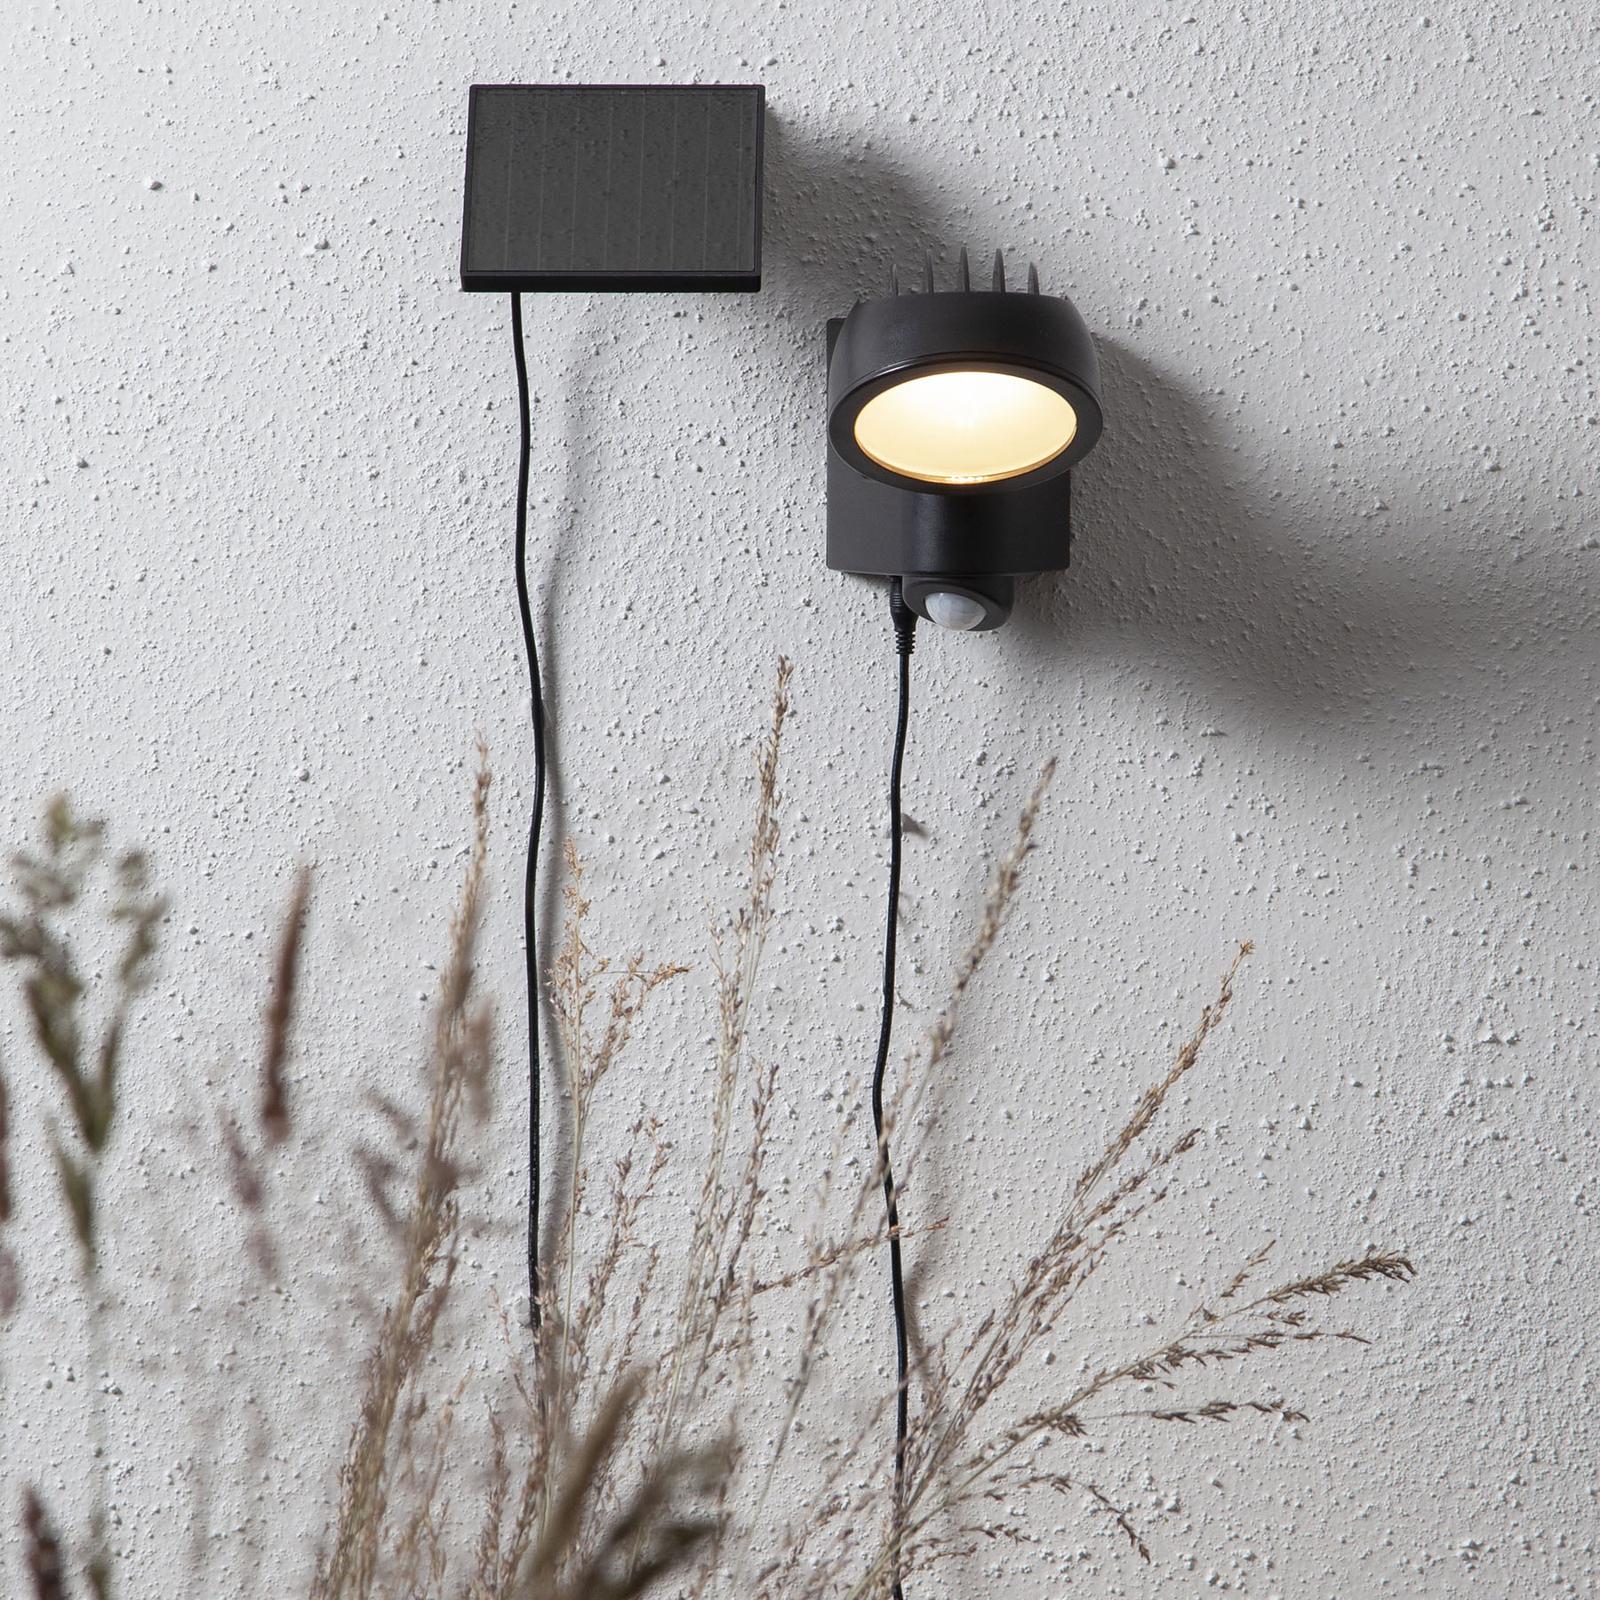 LED-Solarleuchte Powerspot Sensor, rund, 150lm